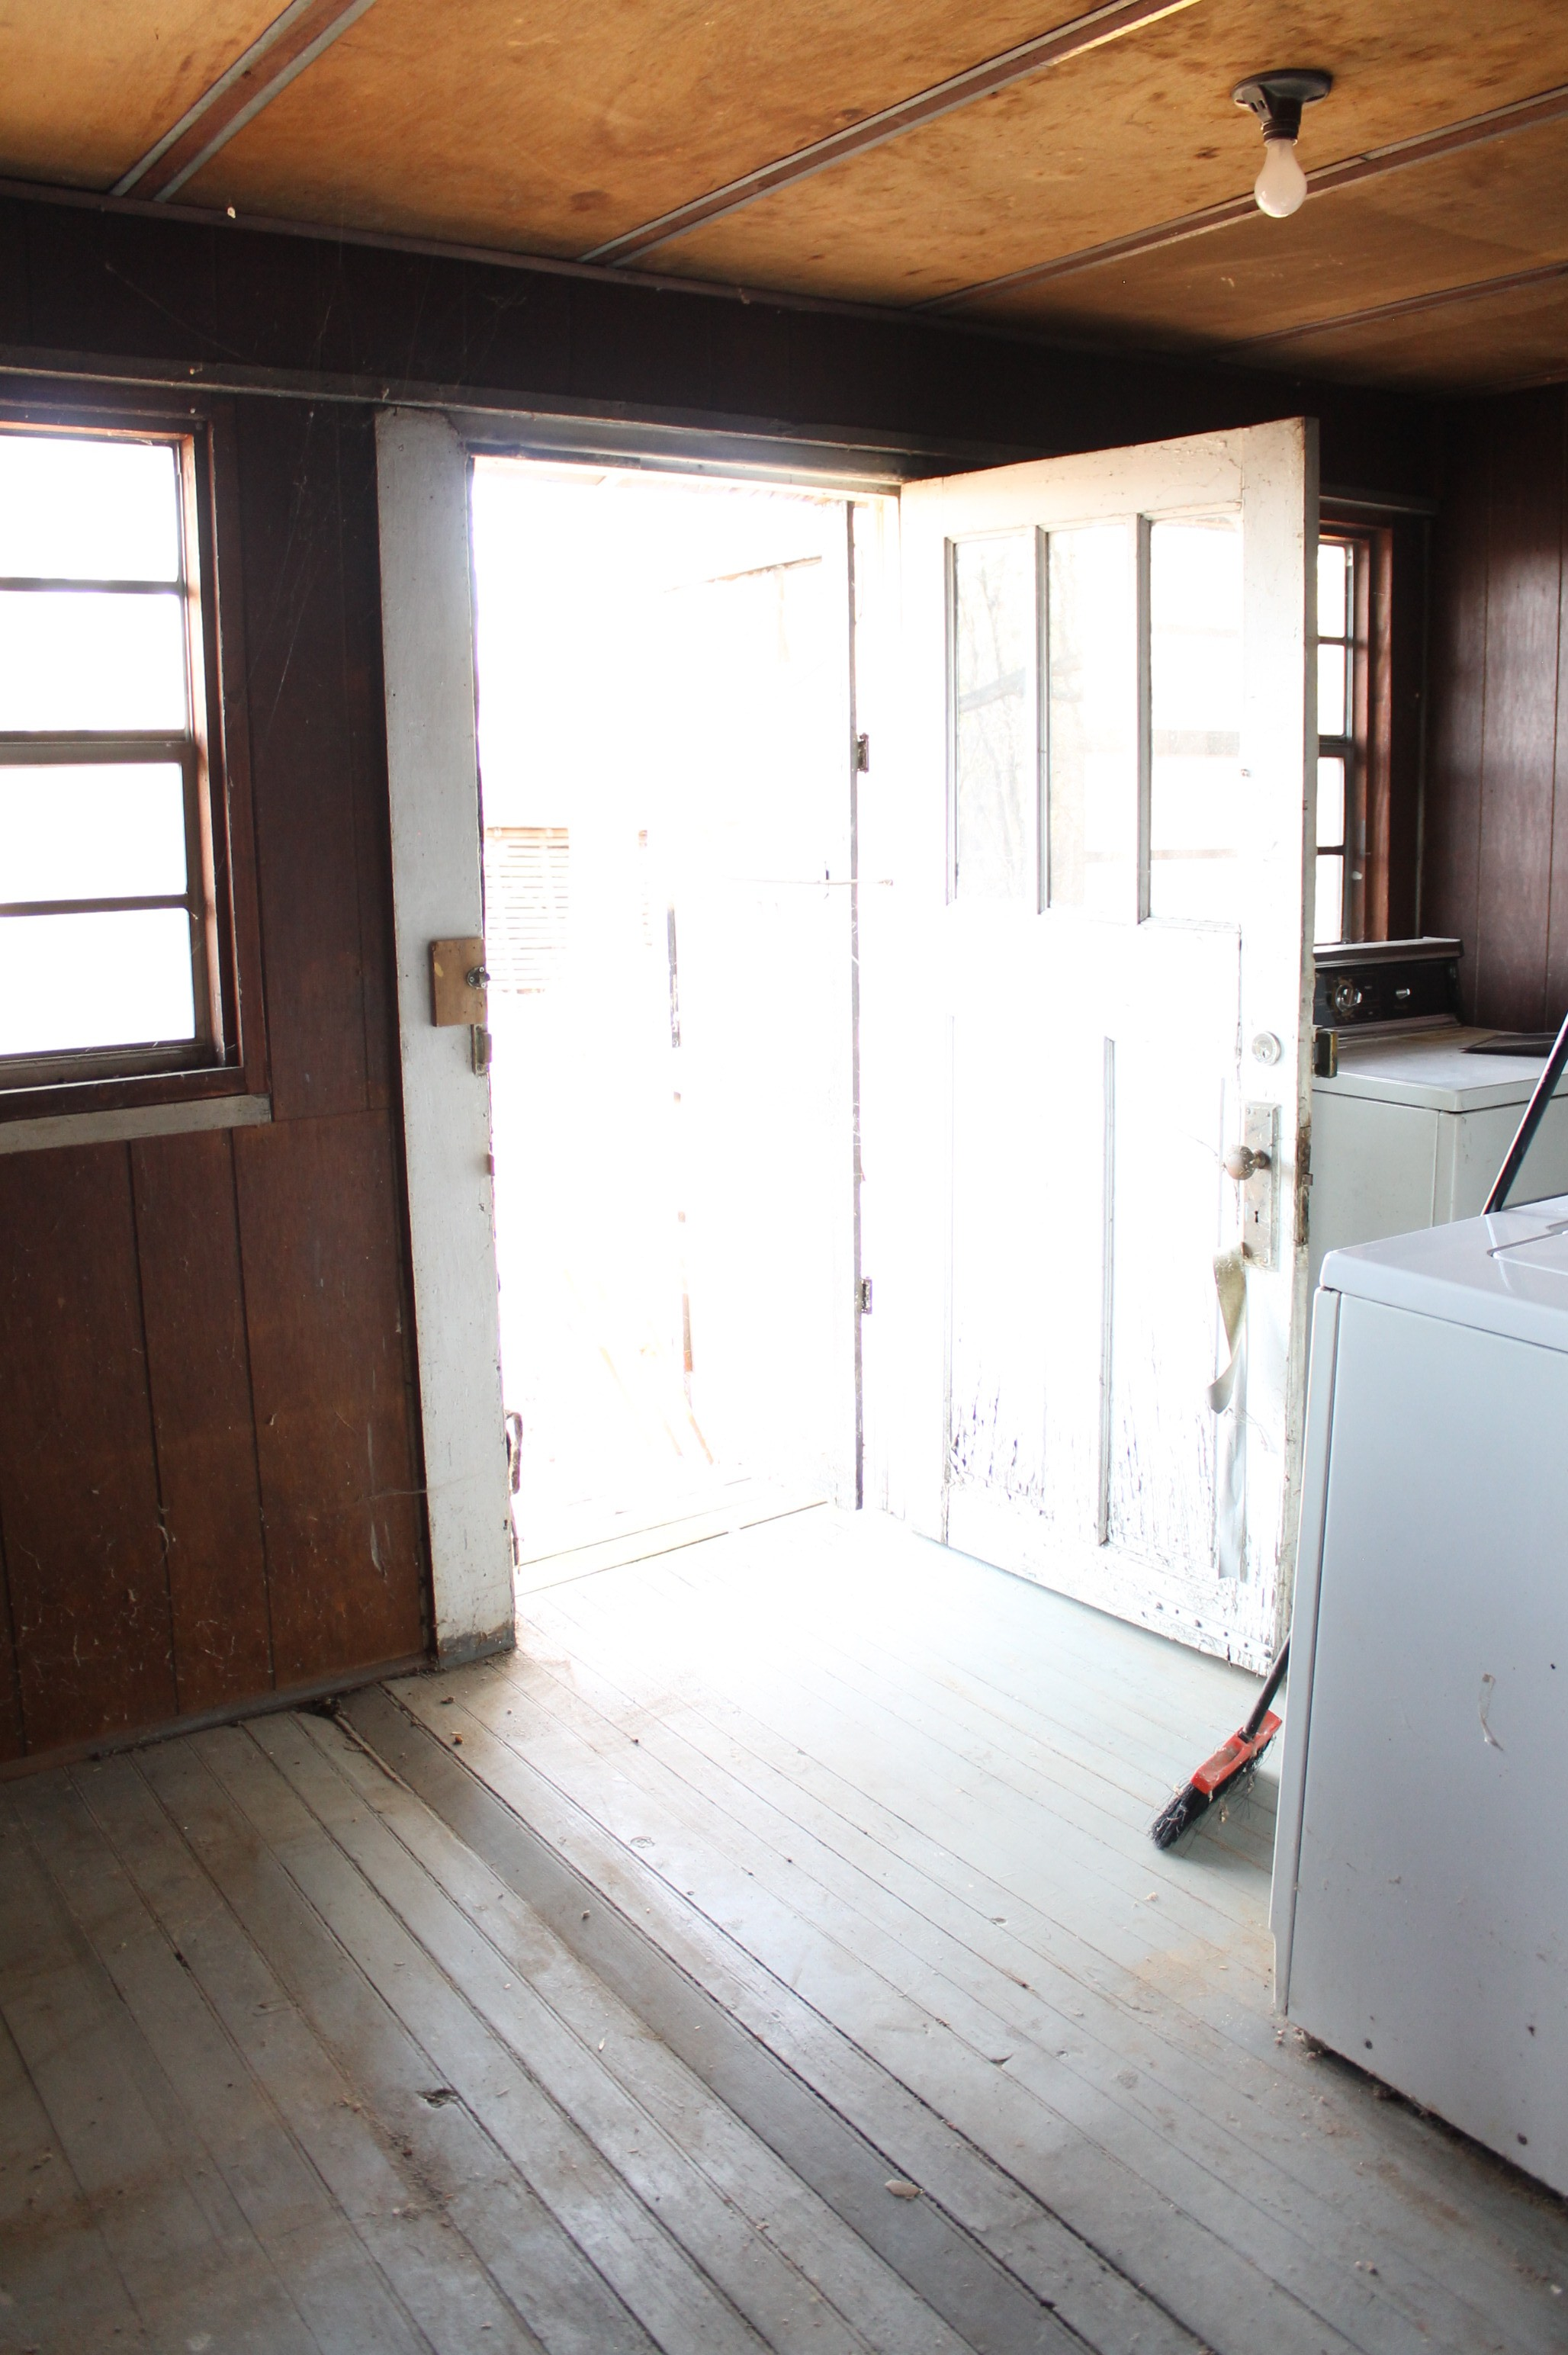 EB Loves Old Houses | Renovation Progress